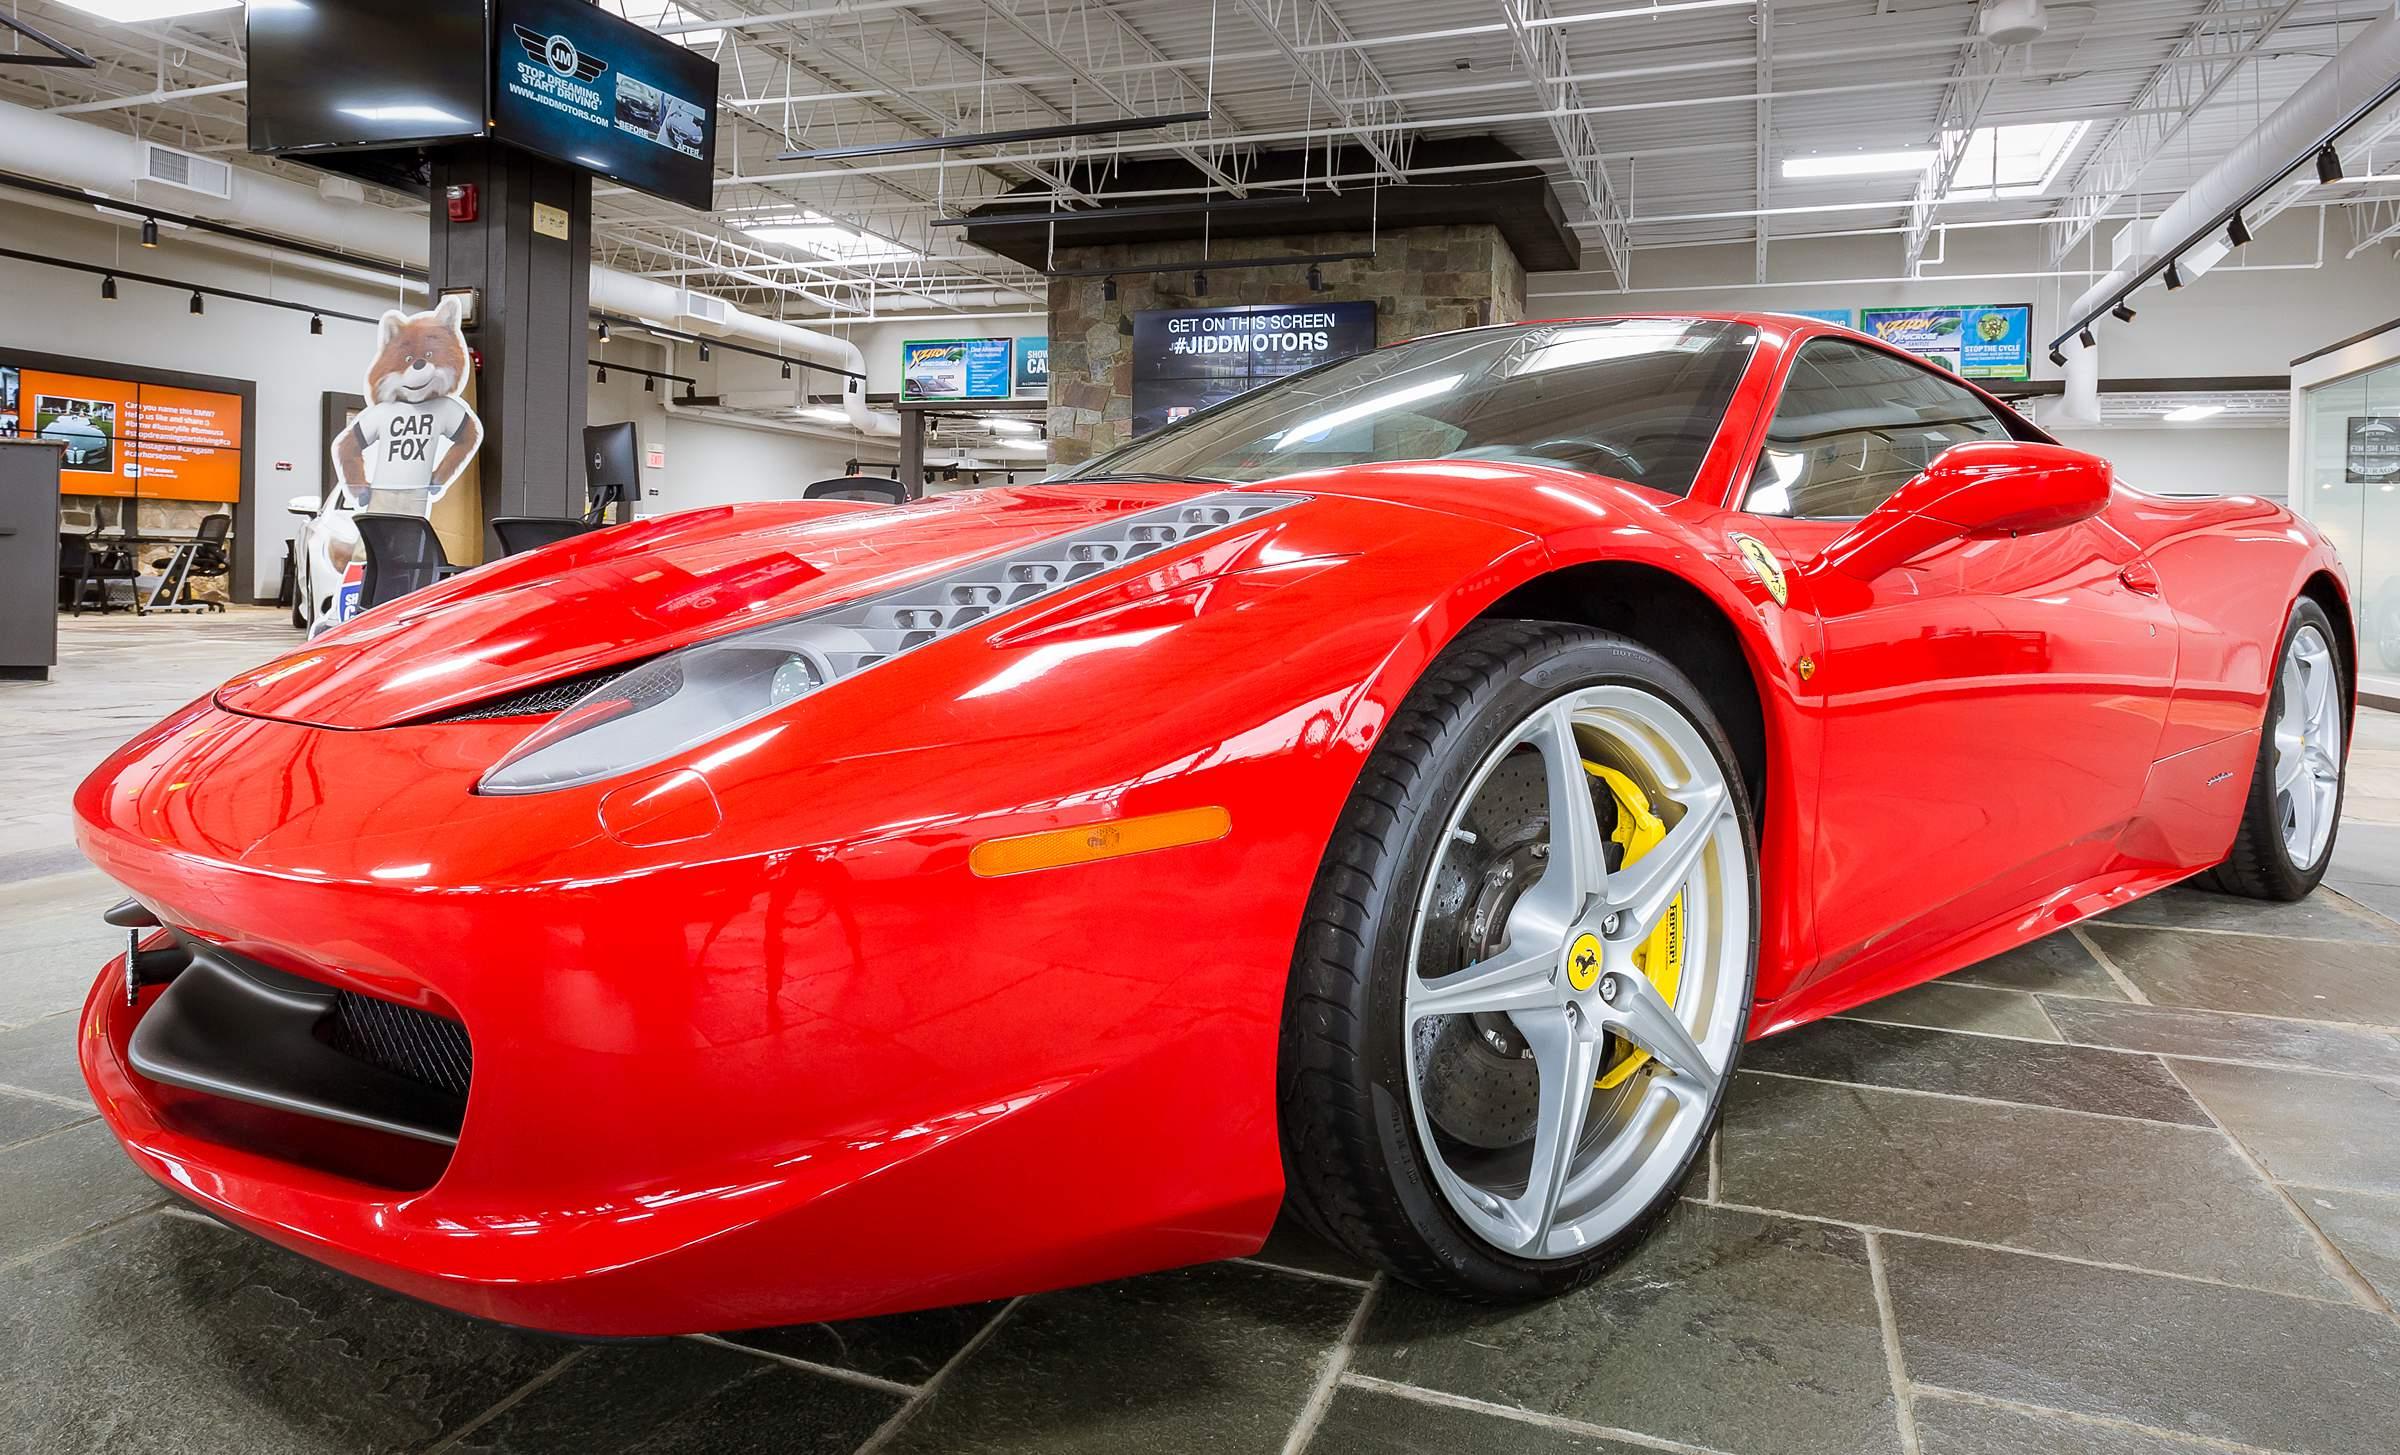 Jidd Motors Ferrari Dealership Chicago Luxury Auto Virtual Tour WalkThru360 - 17